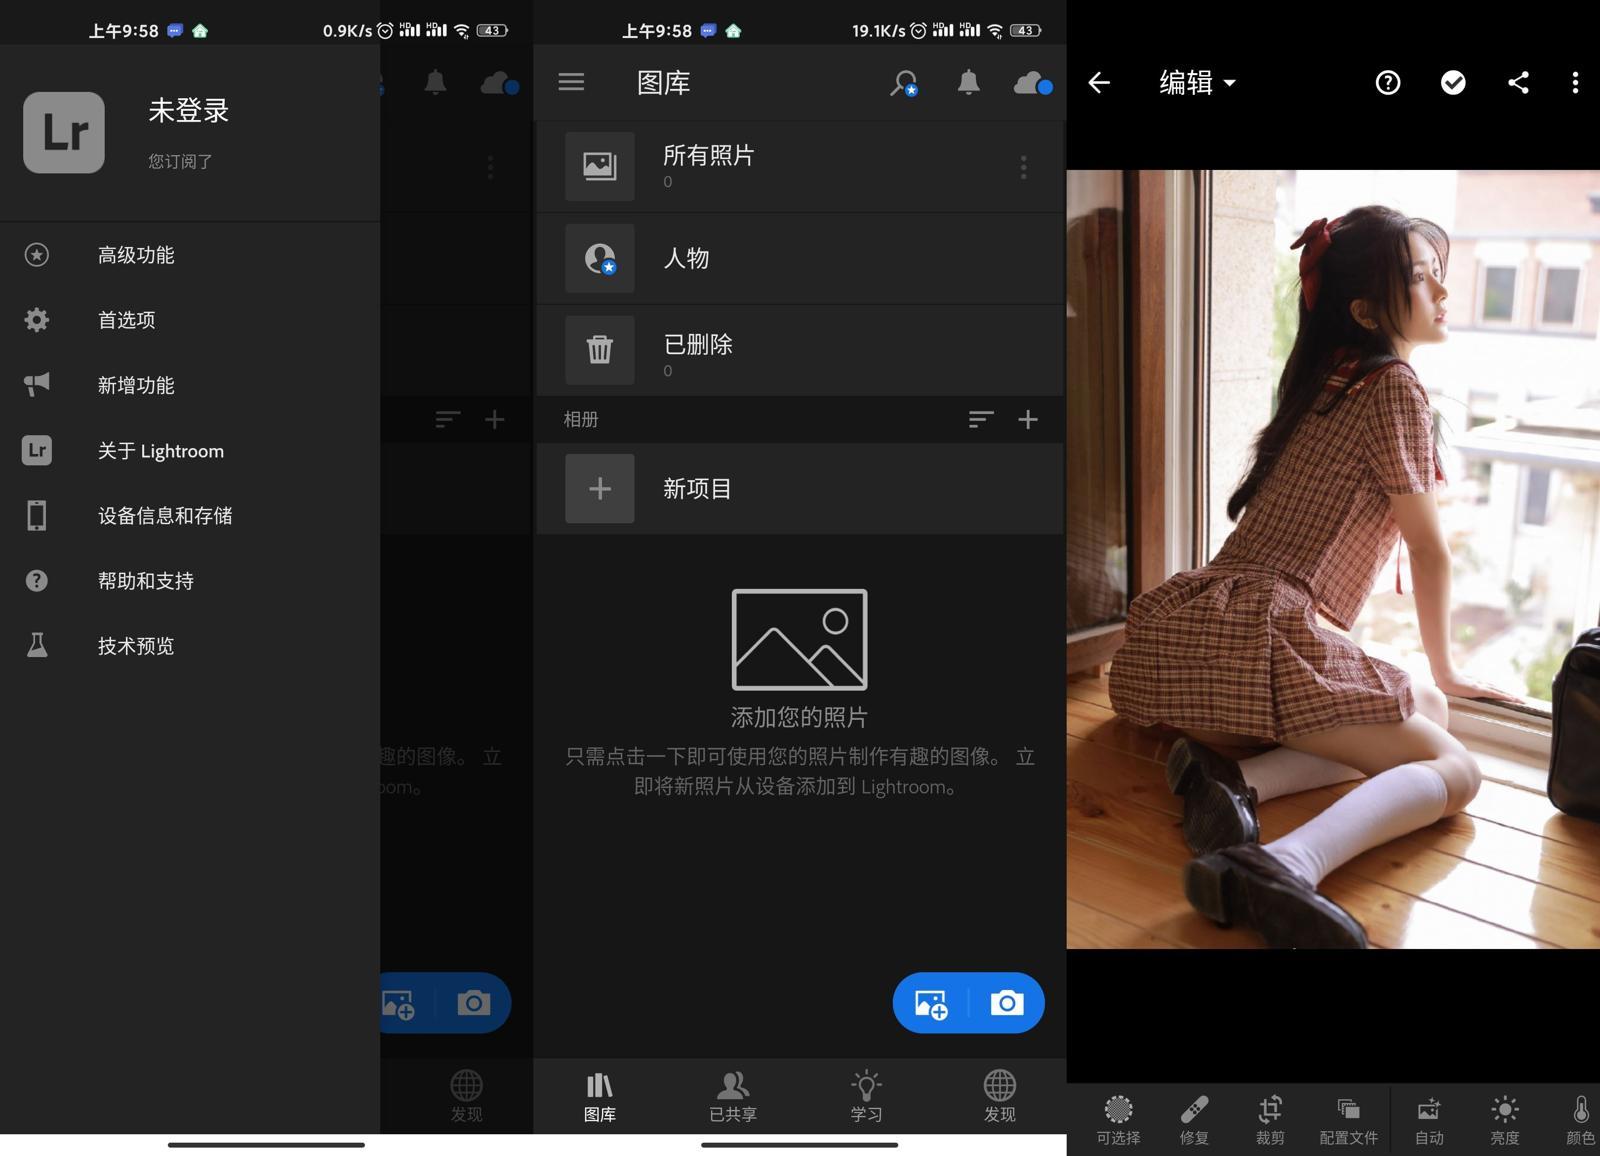 安卓Lightroom v6.4.0高级版